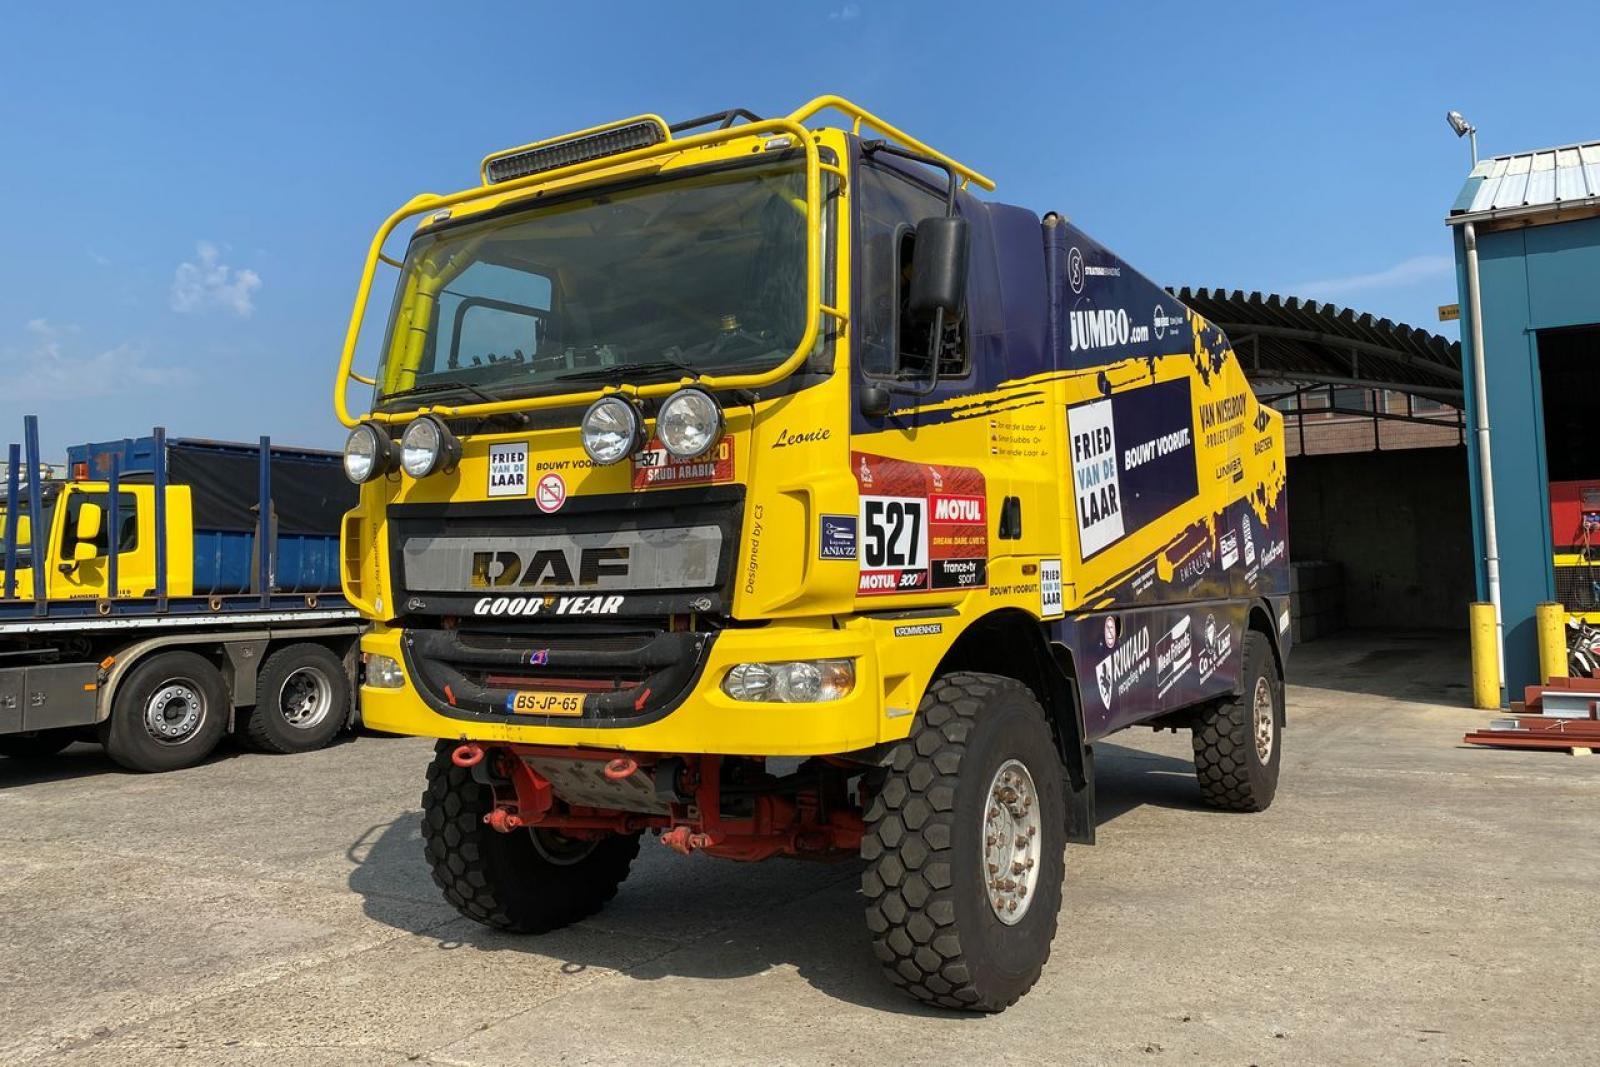 DAF Rally truck 2019 - 3